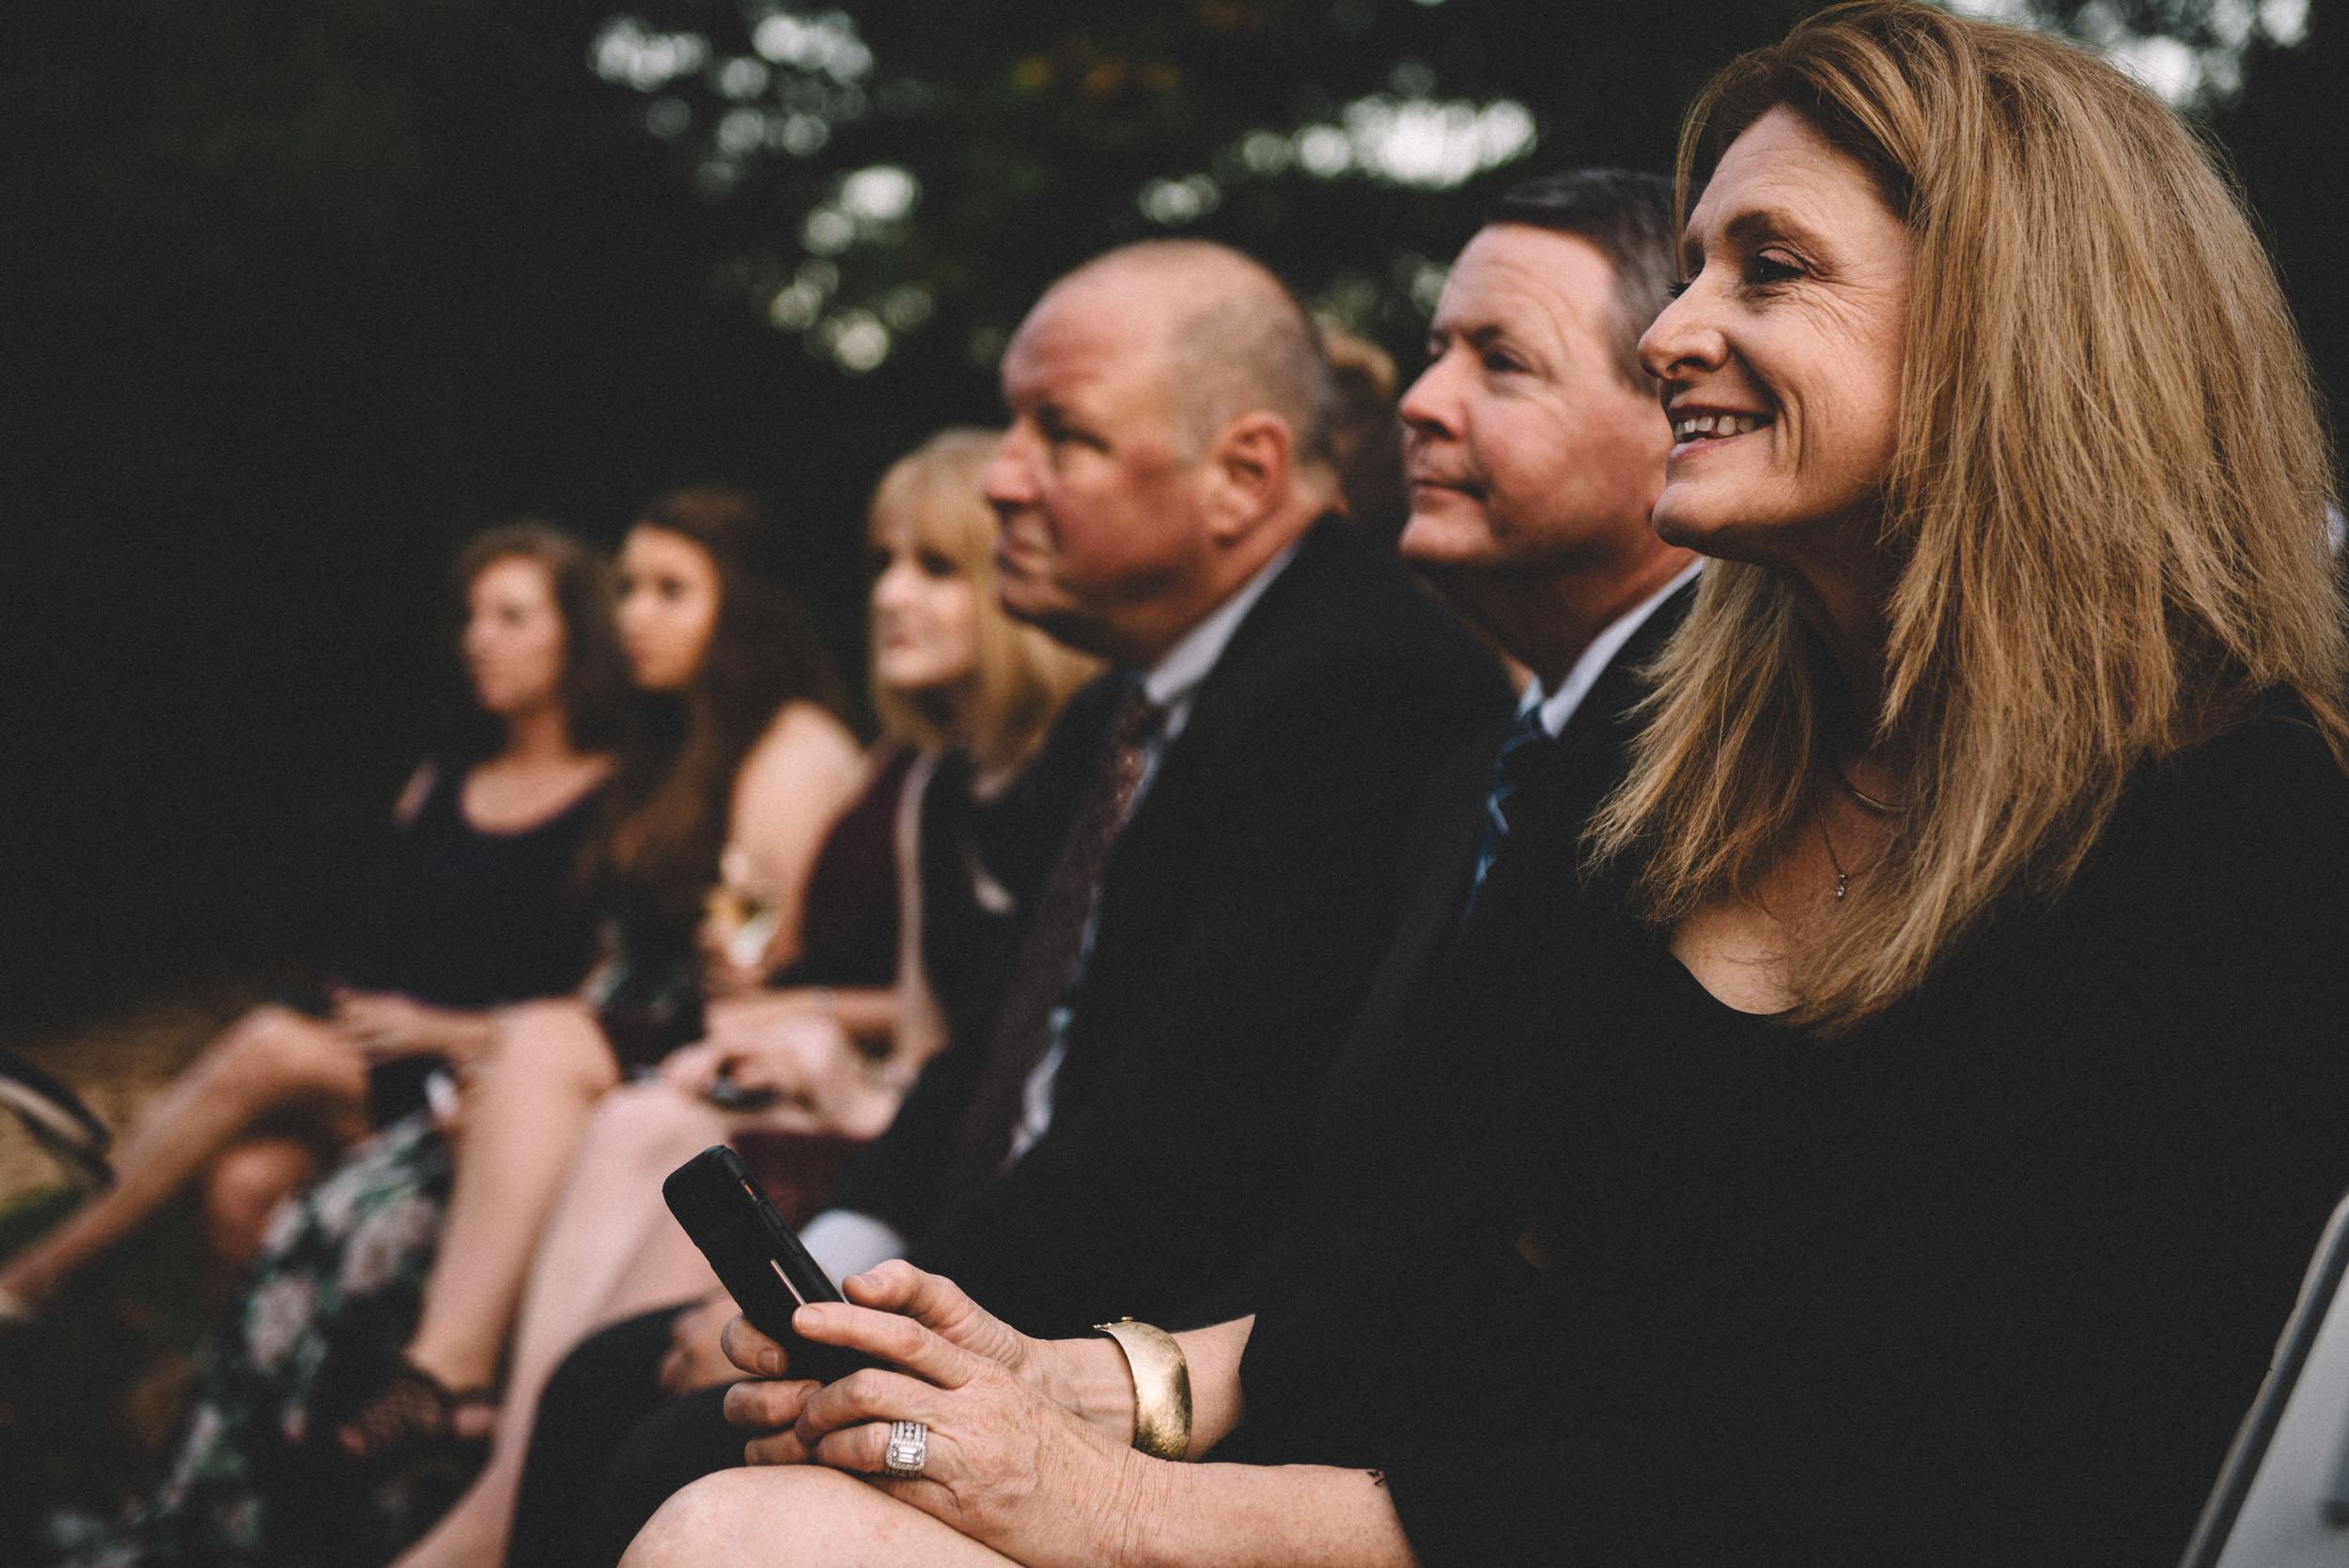 Dumbarton-House-wedding-43.jpg